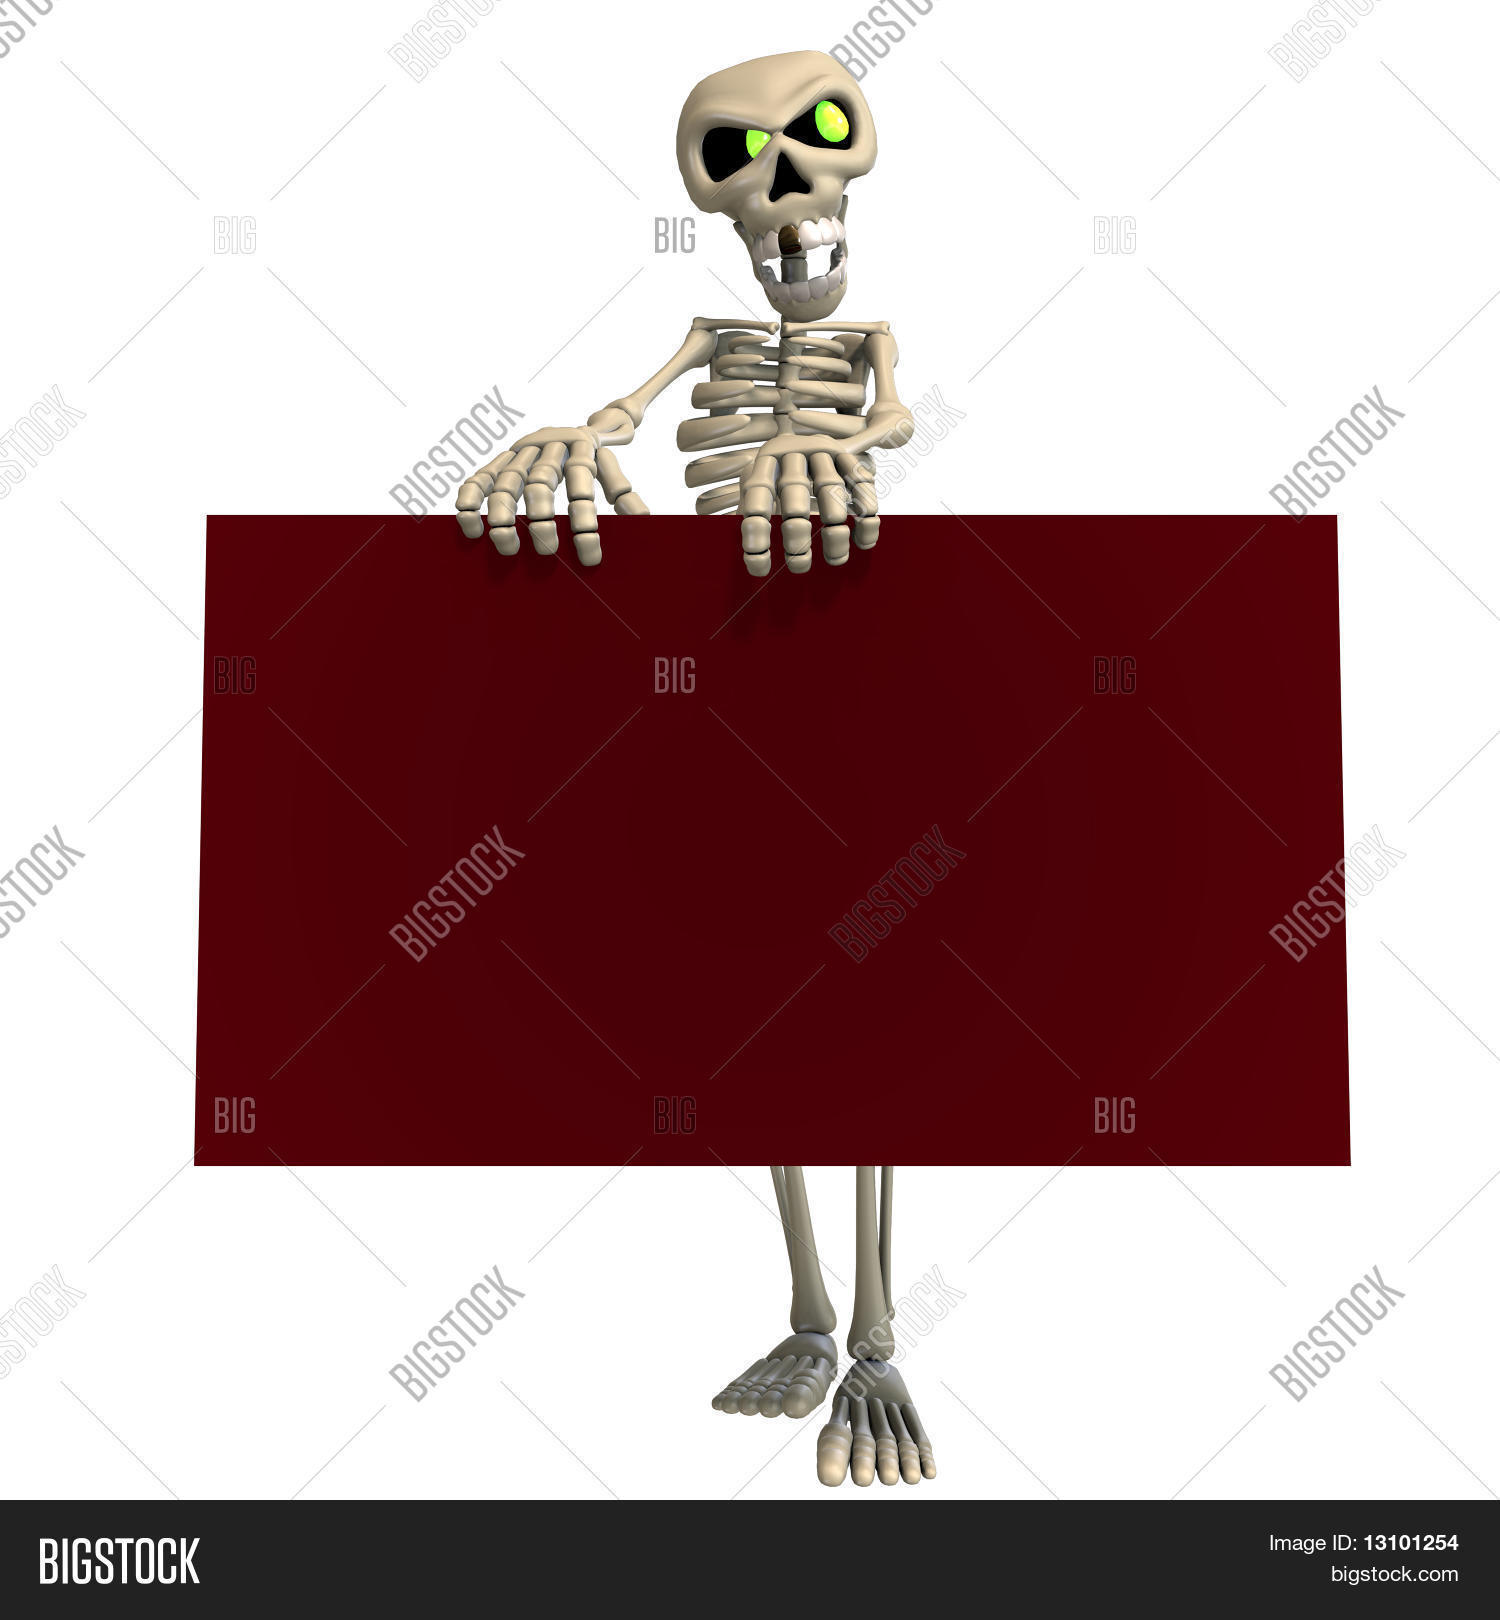 Funny cartoon skeleton invites you image photo bigstock